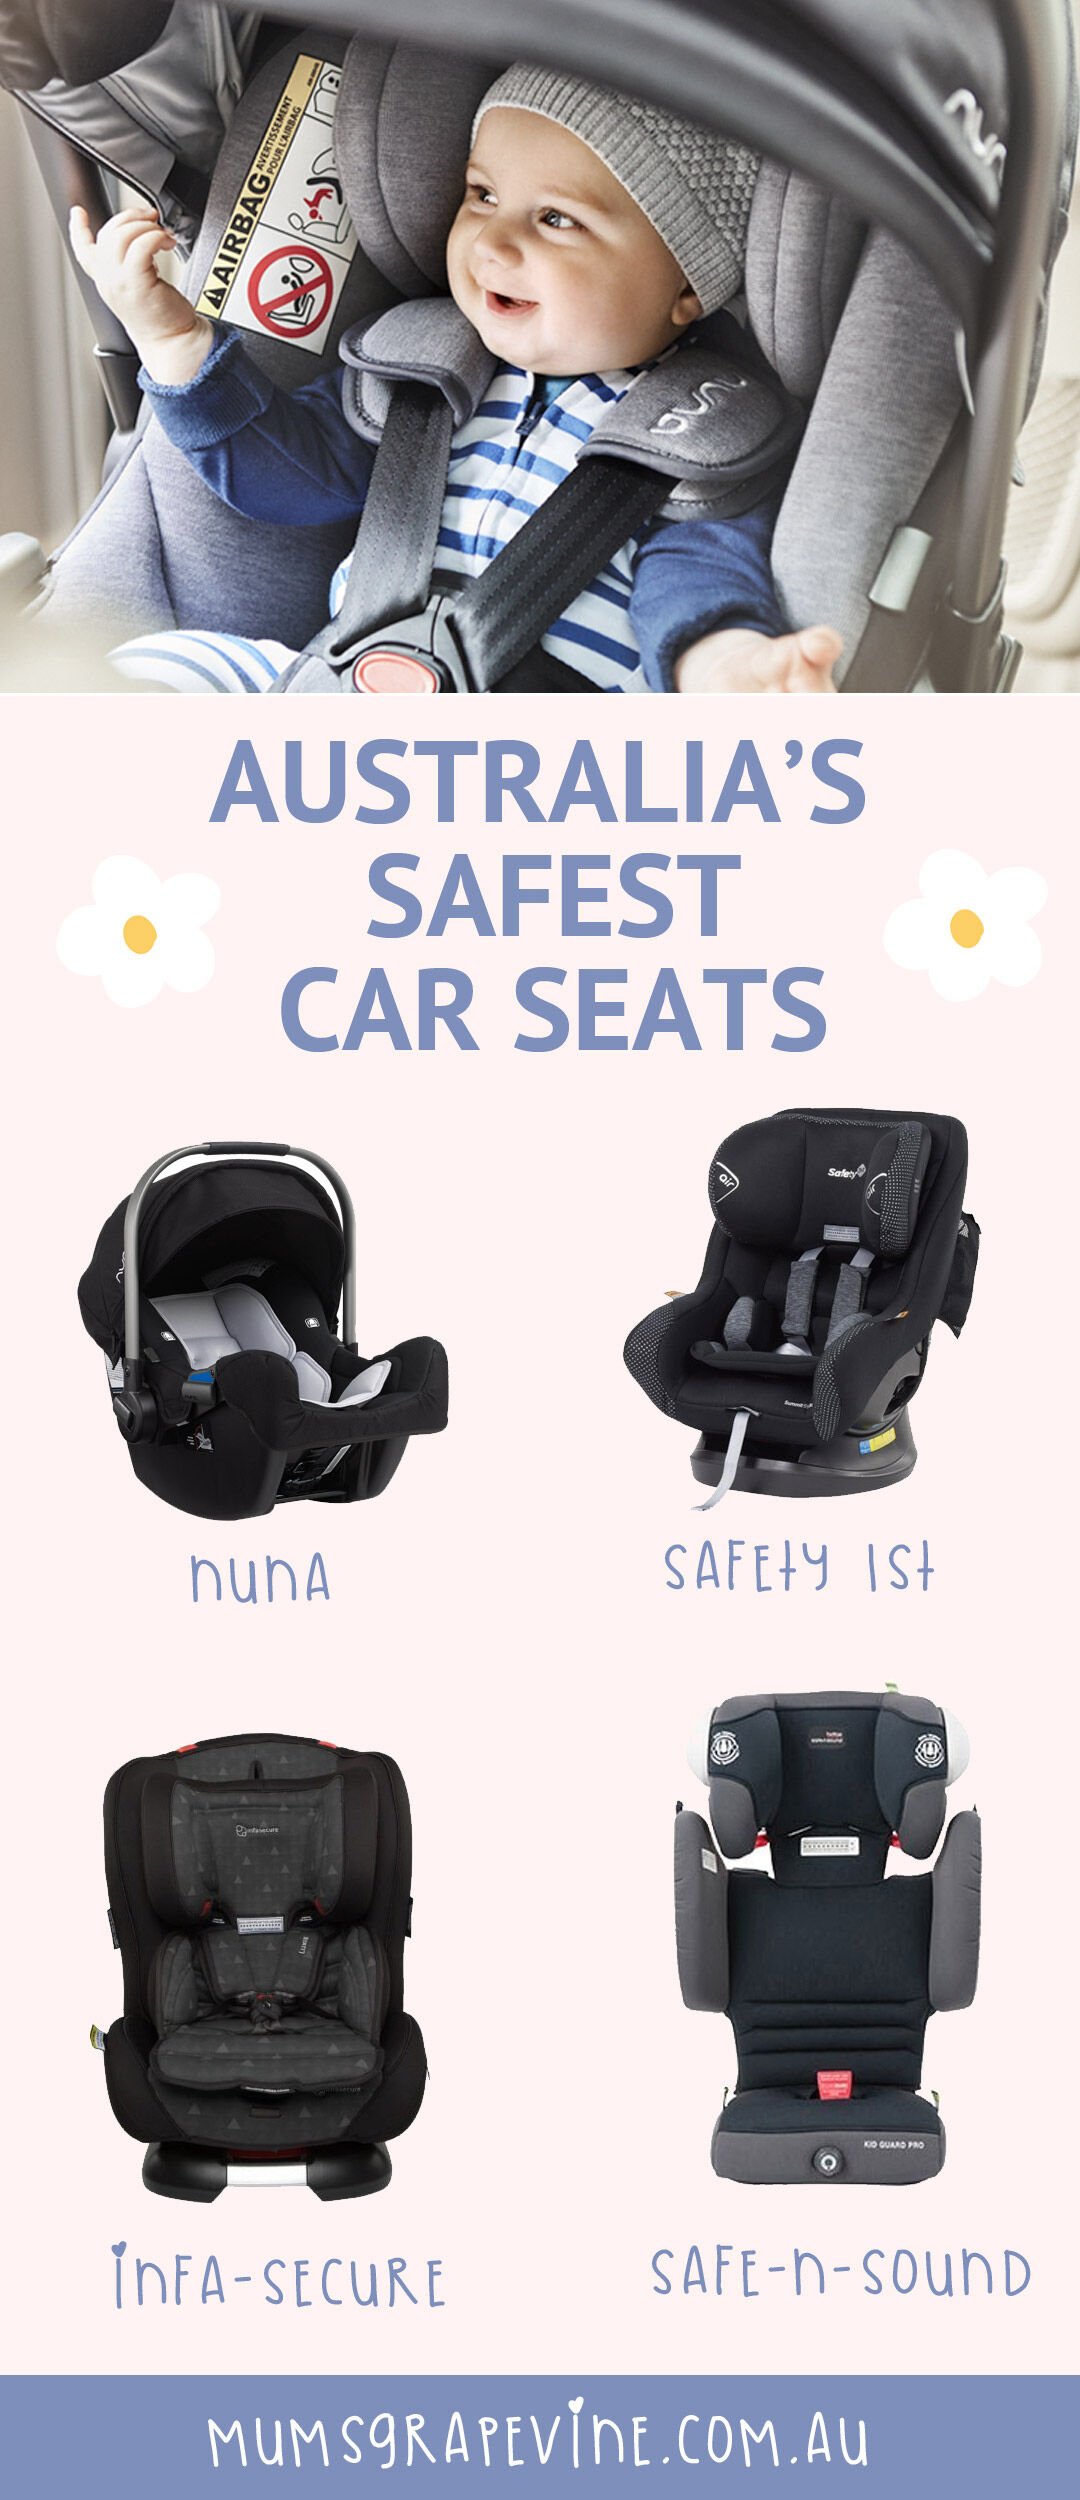 Australia's Safest Car Seats